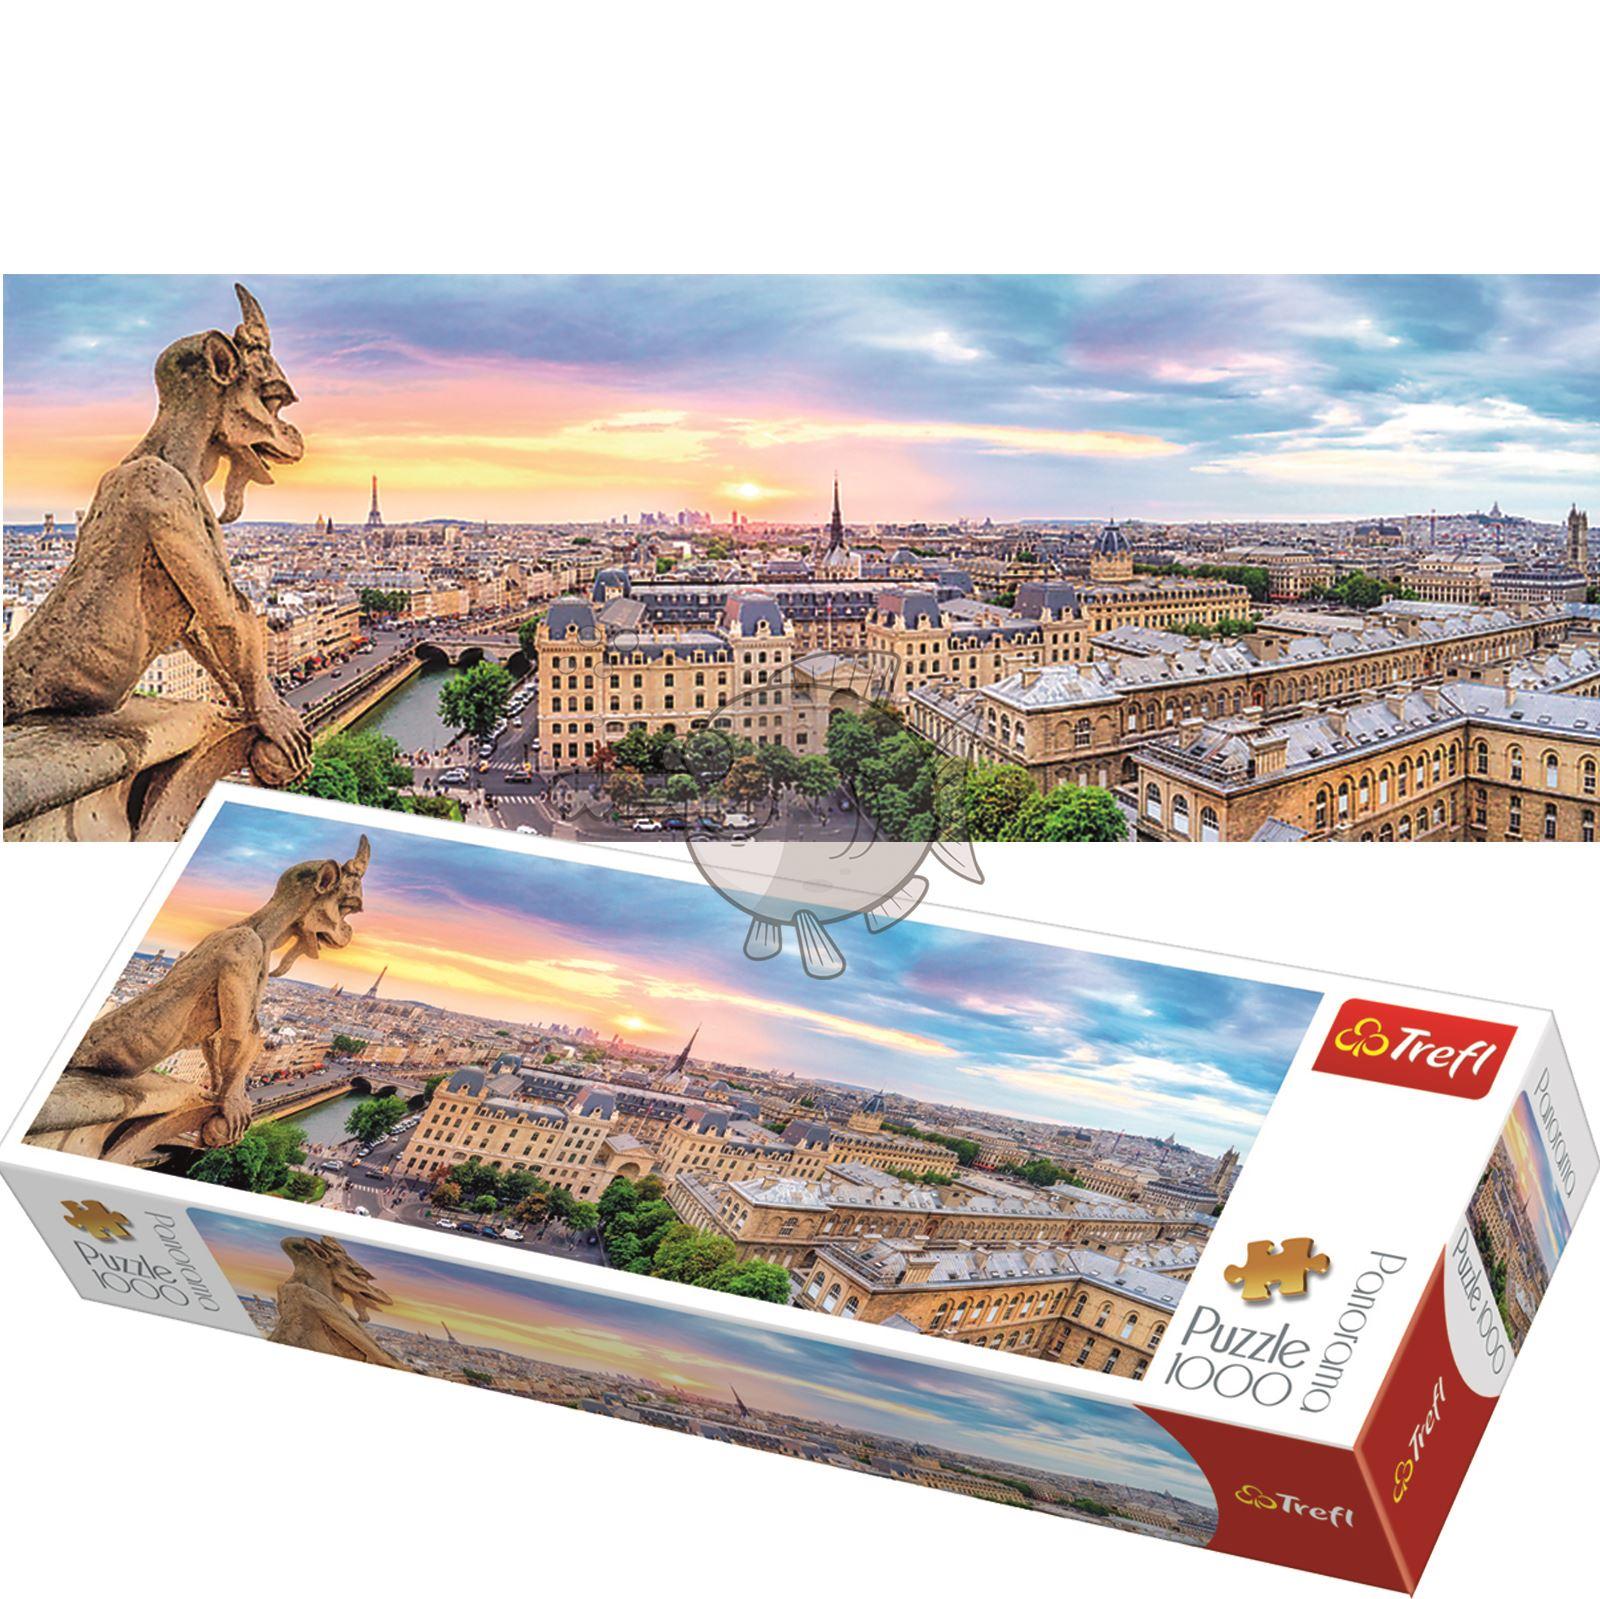 Trefl-300-500-1000-1500-2000-3000-4000-6000-Piece-Jigsaw-Puzzle-Landscapes-City thumbnail 443